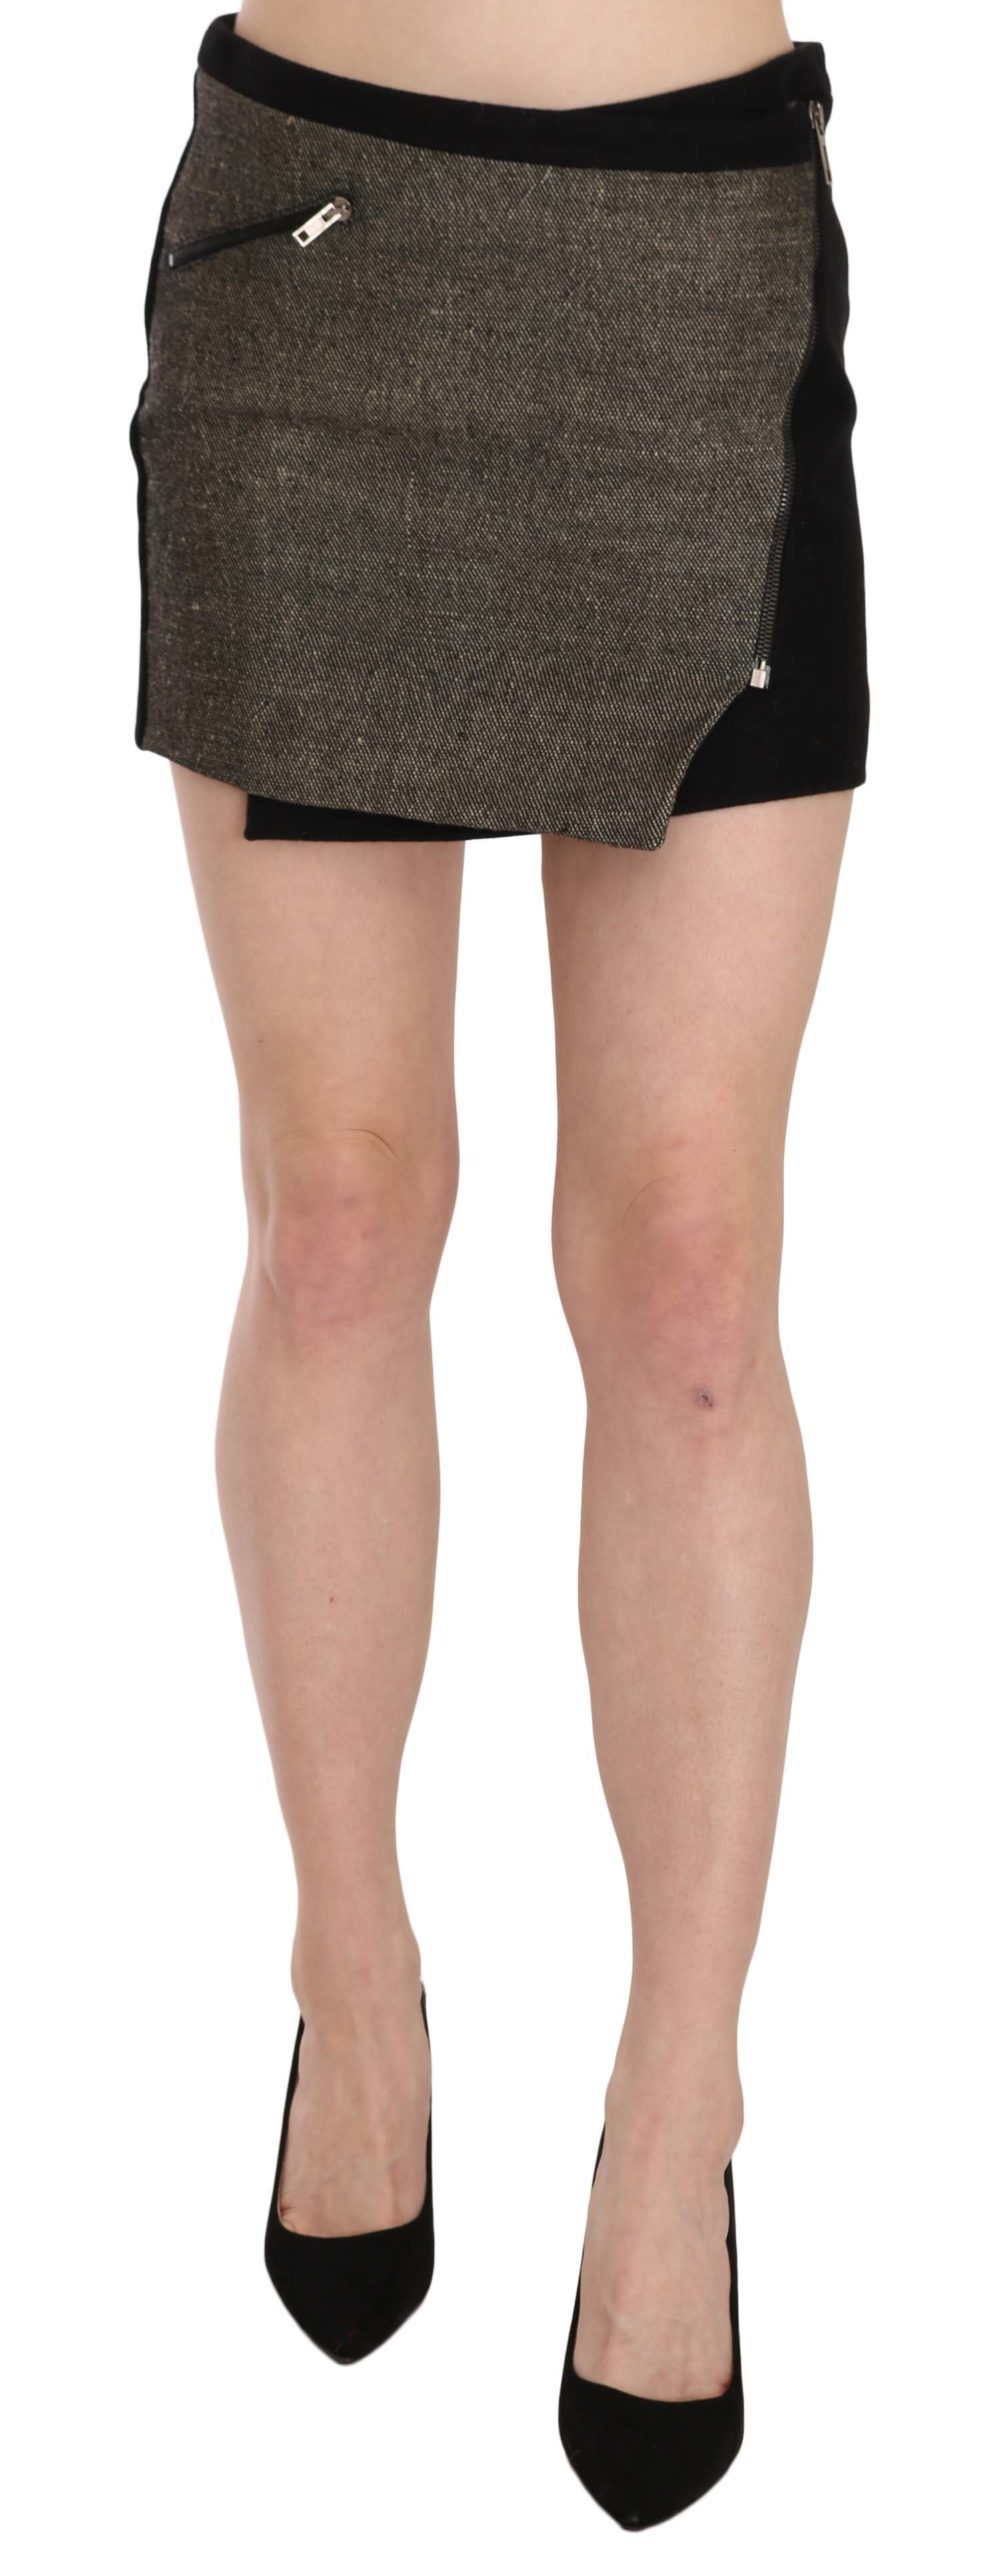 Costume National Women's Wrap Around Mini Skirt Black TSH3953 - IT44|L